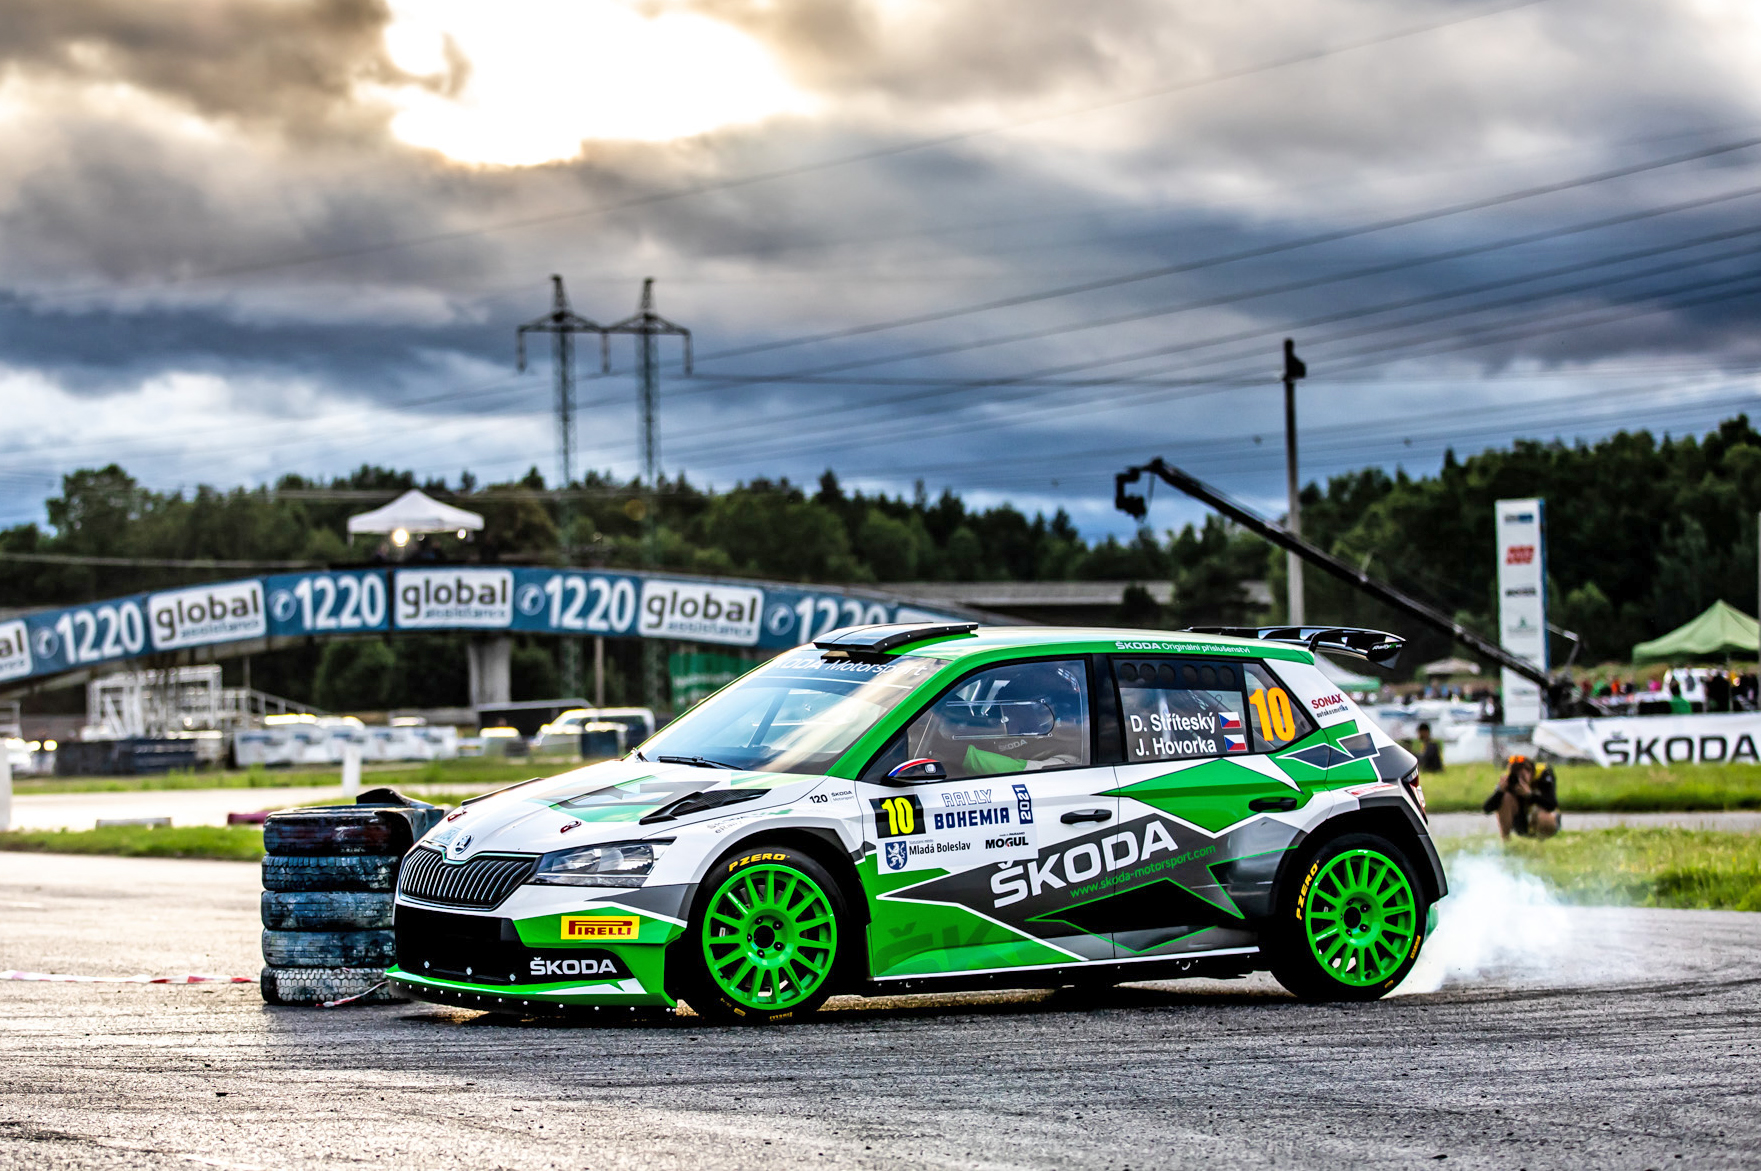 Jan Kopecký celebrates 120 years of SKODA in motorsport with ninth victory at Bohemia Rally - Image 6